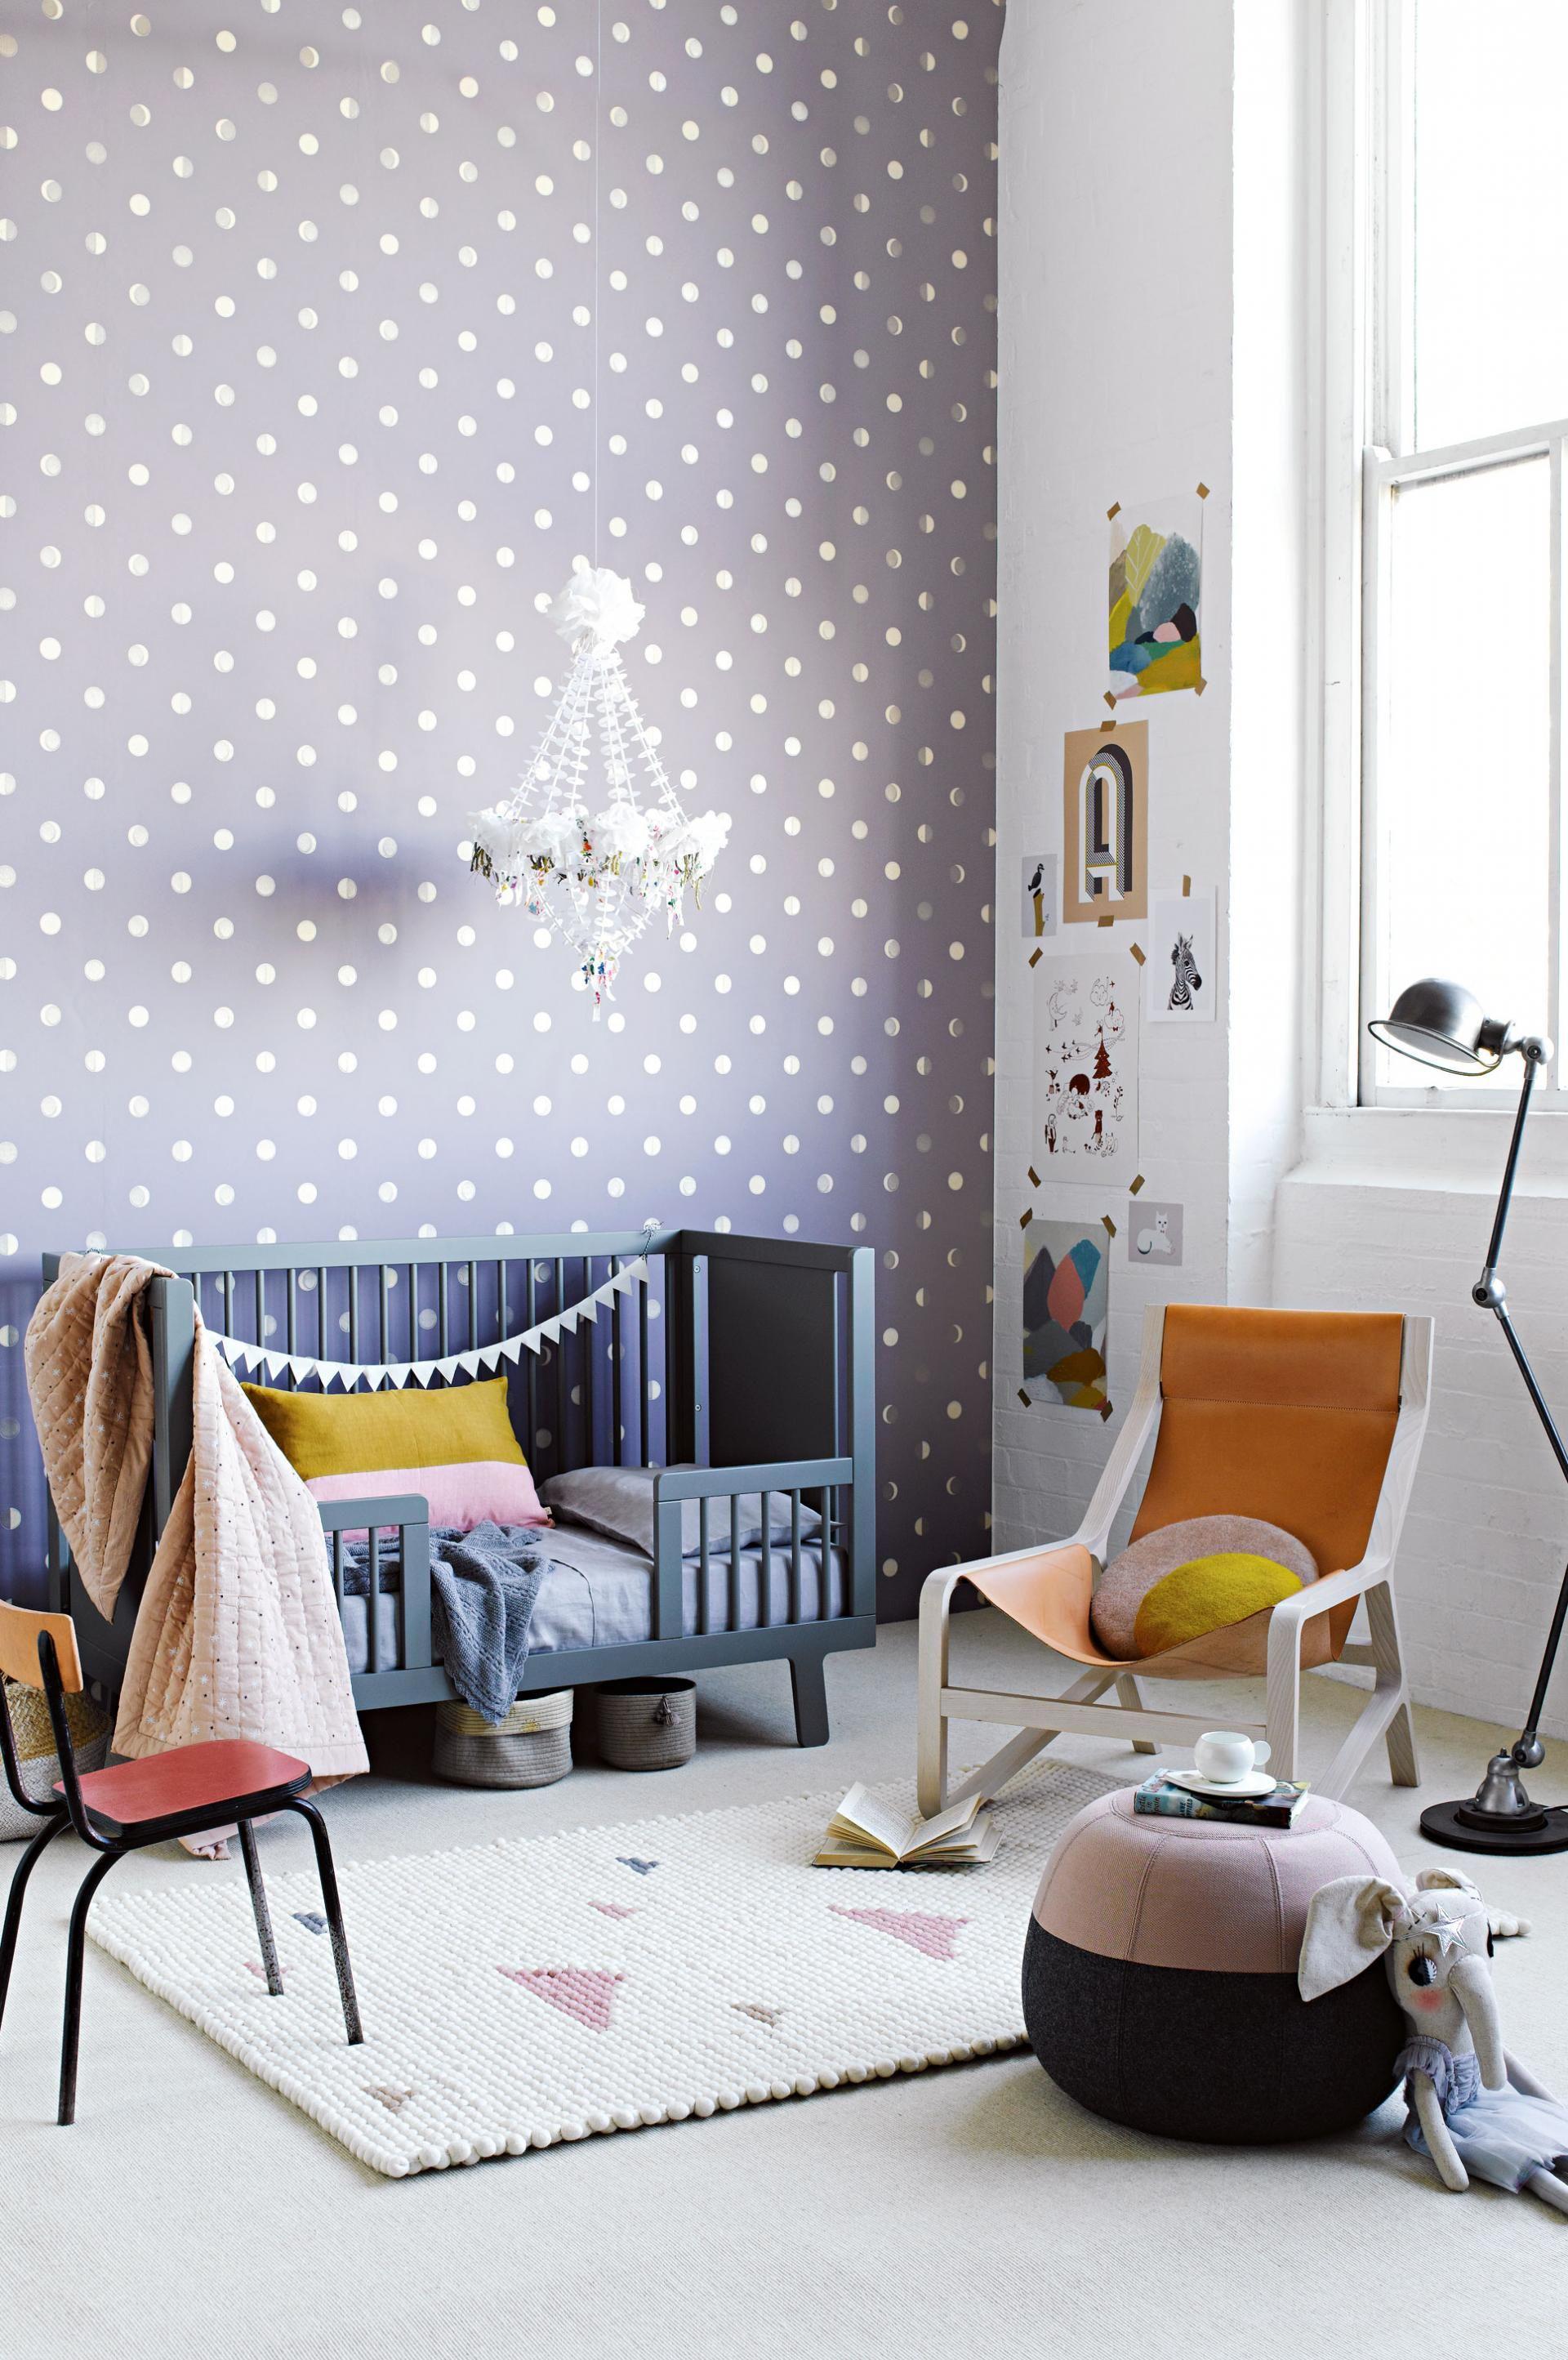 wonderful ways with wallpaper from insideout com au styling by rh pinterest com Rainbow Polka Dots Wallpaper Kate Spade Polka Dot Wallpaper